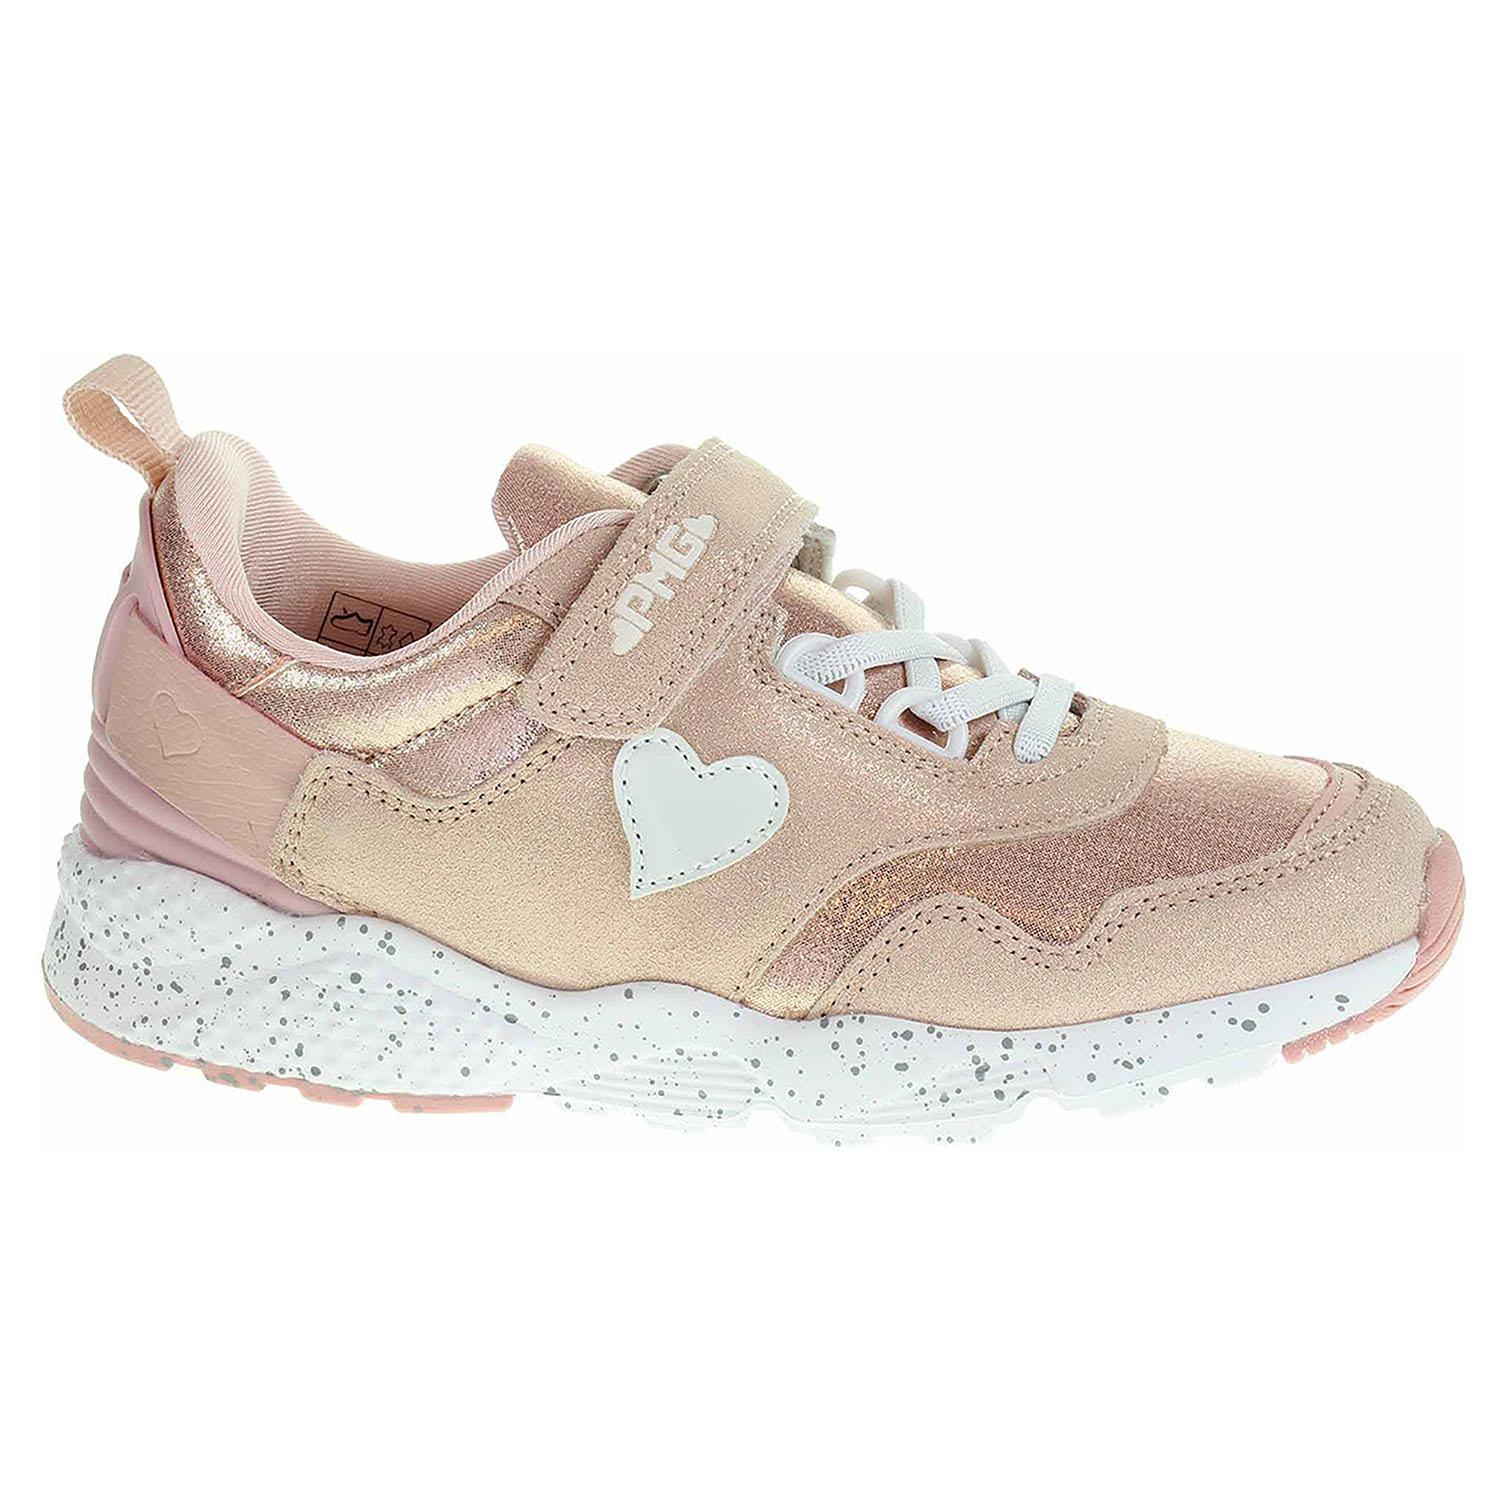 Dívčí obuv Primigi 4457900 rosa-rosa 4457900 31